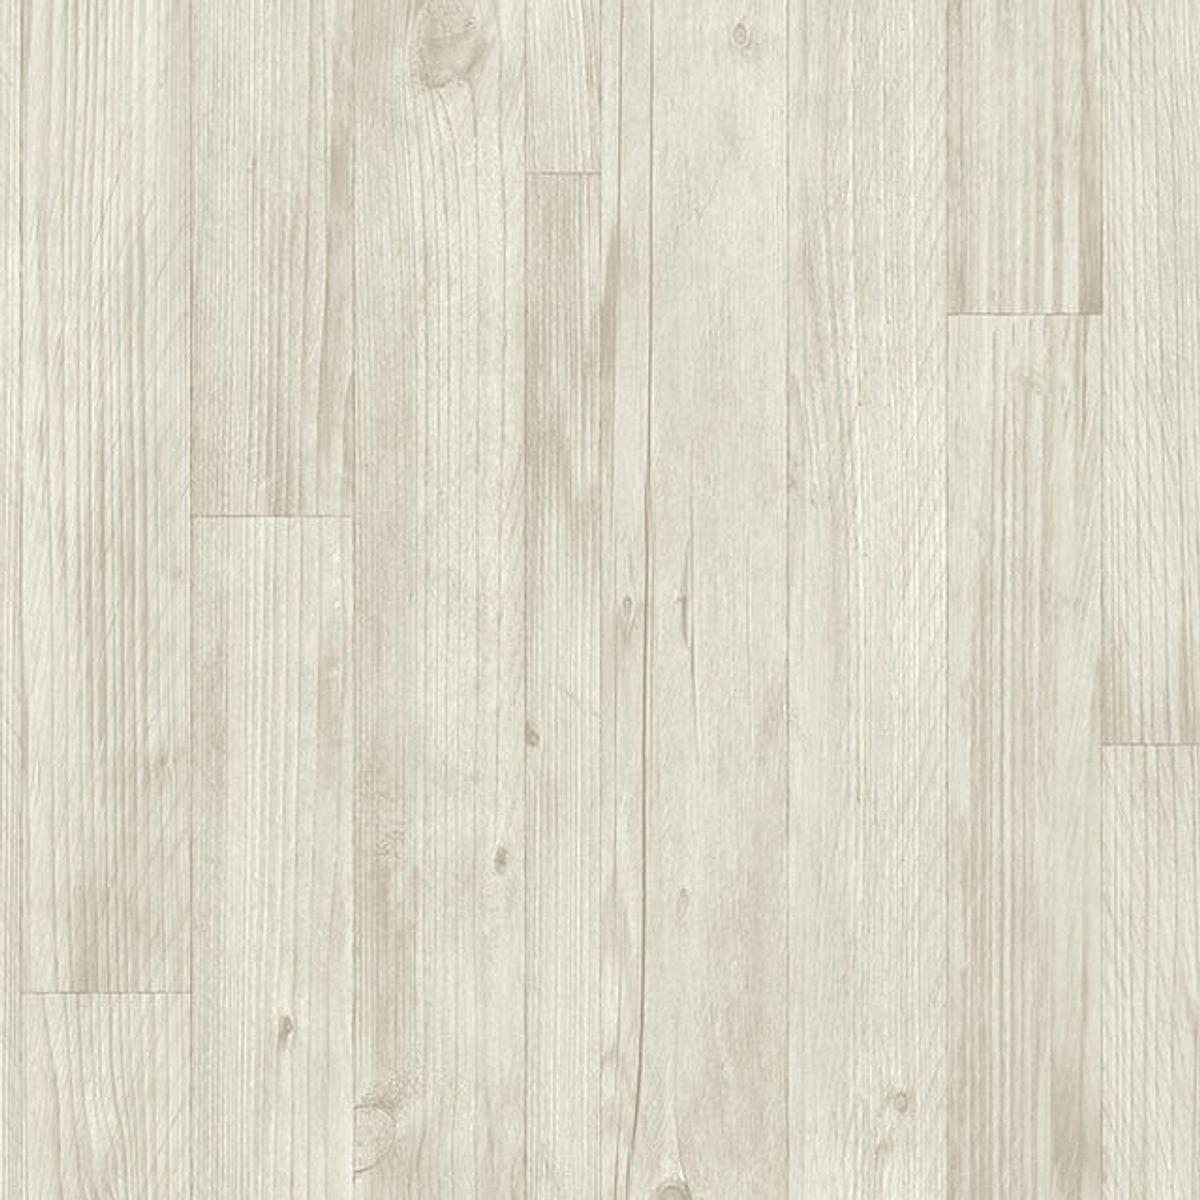 Sol vinyle Verone lame blanc grise 200cm